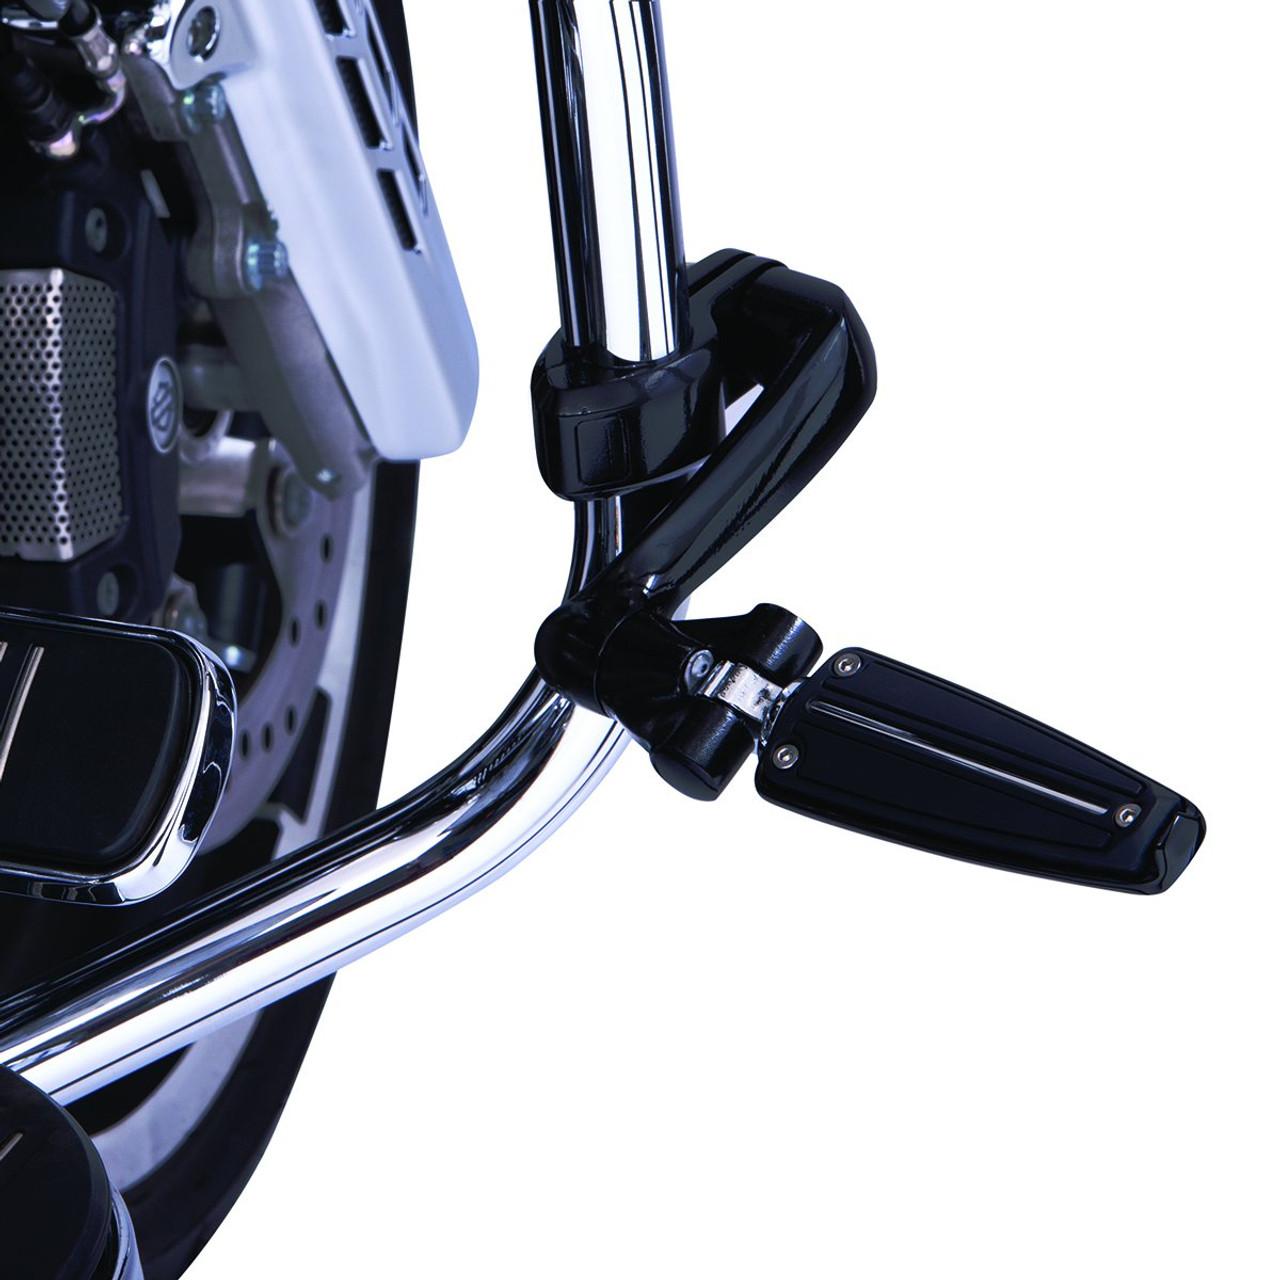 Ciro Chrome Floorboard Hi-Way Peg Mount w// Adjustable Arm for Harley FLH//T 09-up